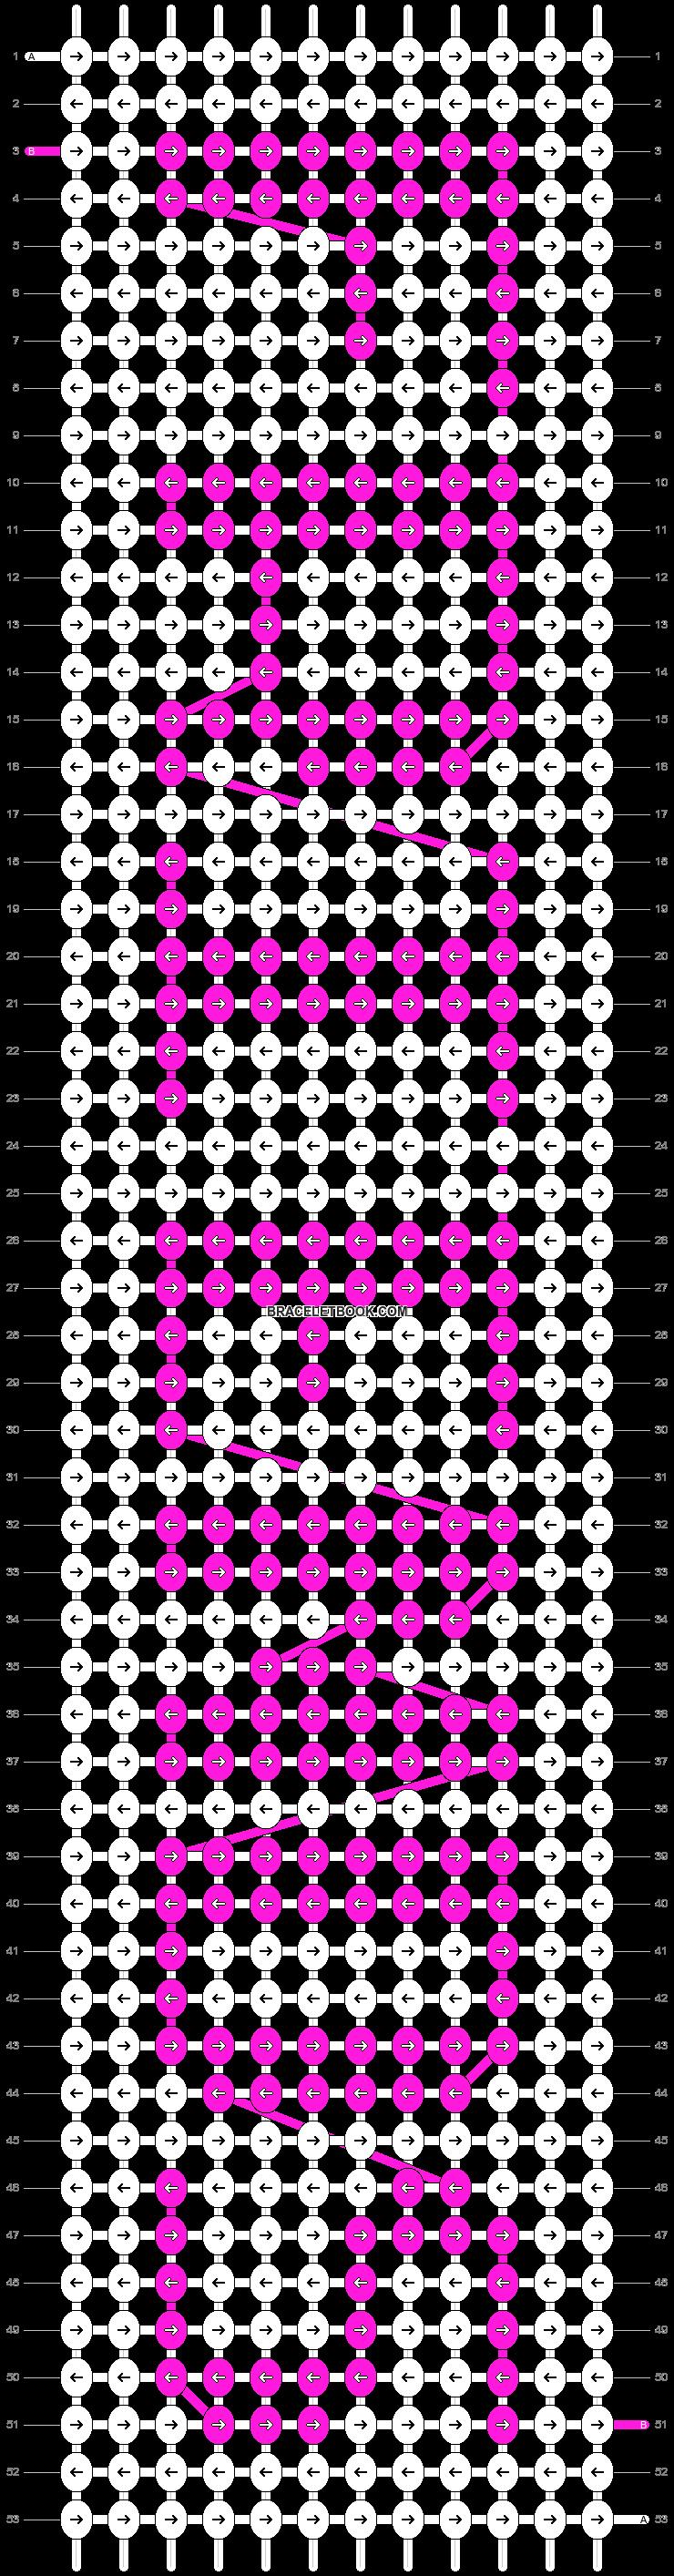 Alpha pattern #6332 pattern